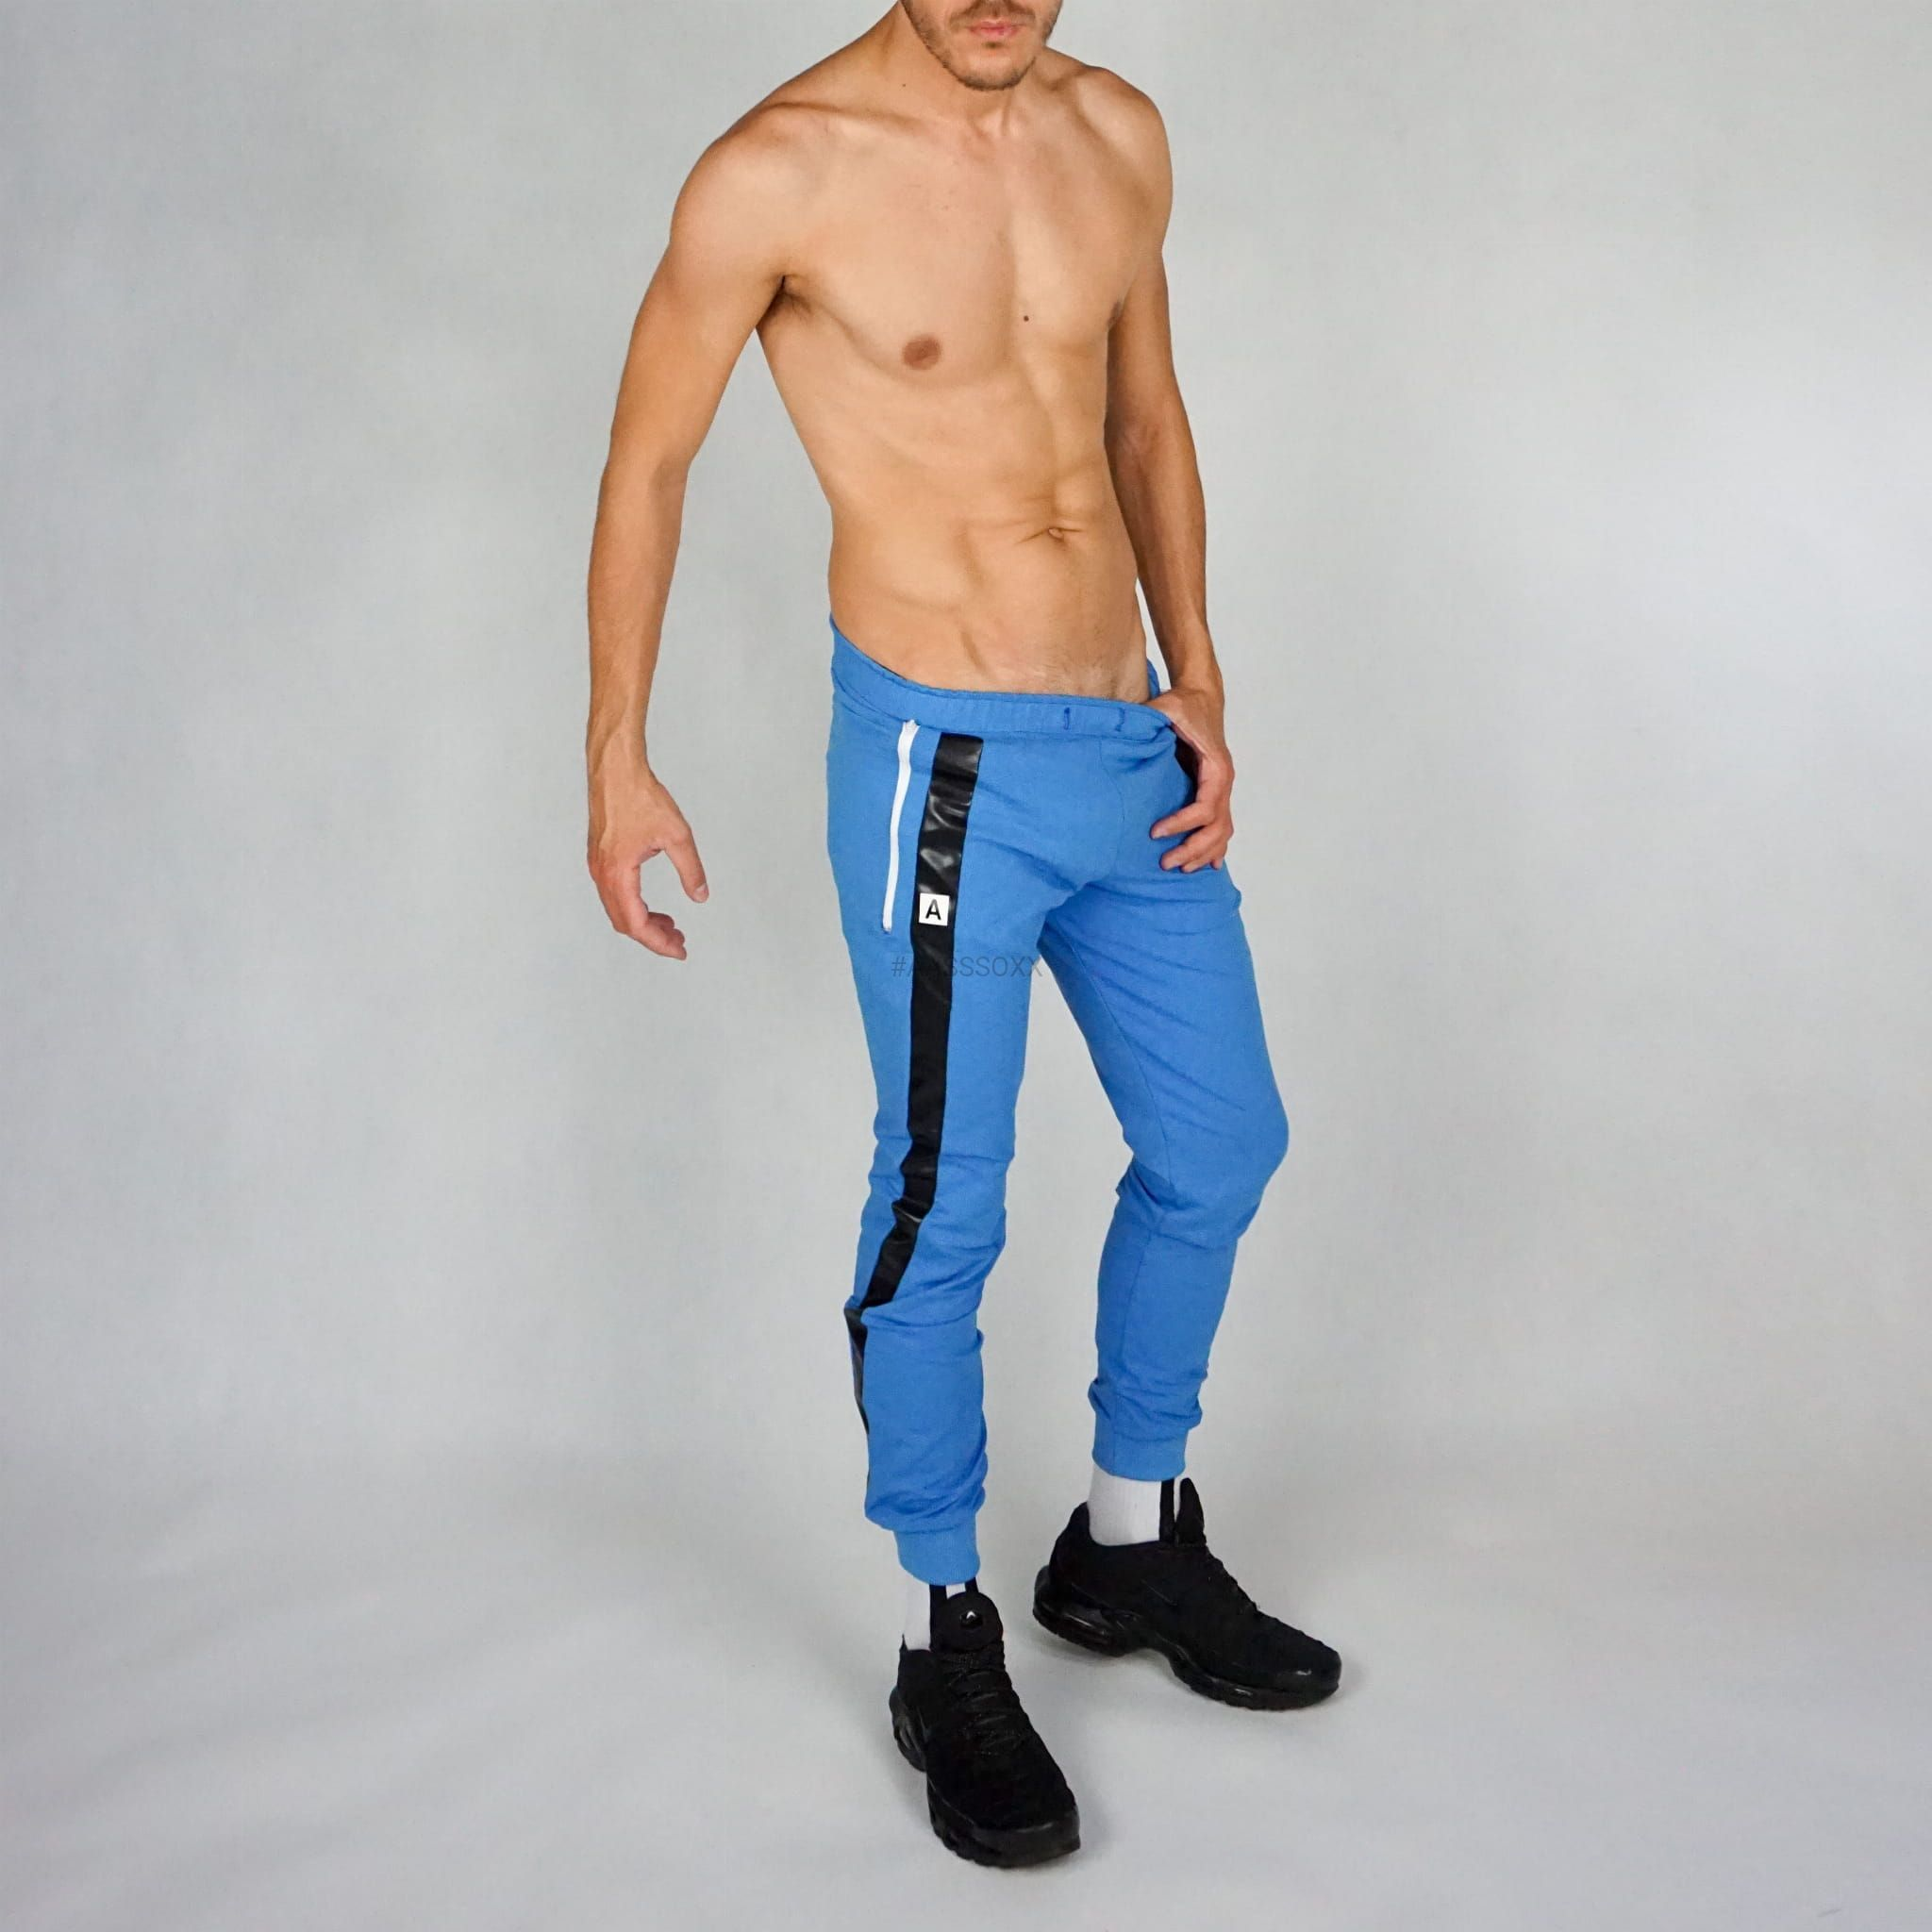 SWEATPANTS SPF (SPORT PUBLIC FUCK) BLUE